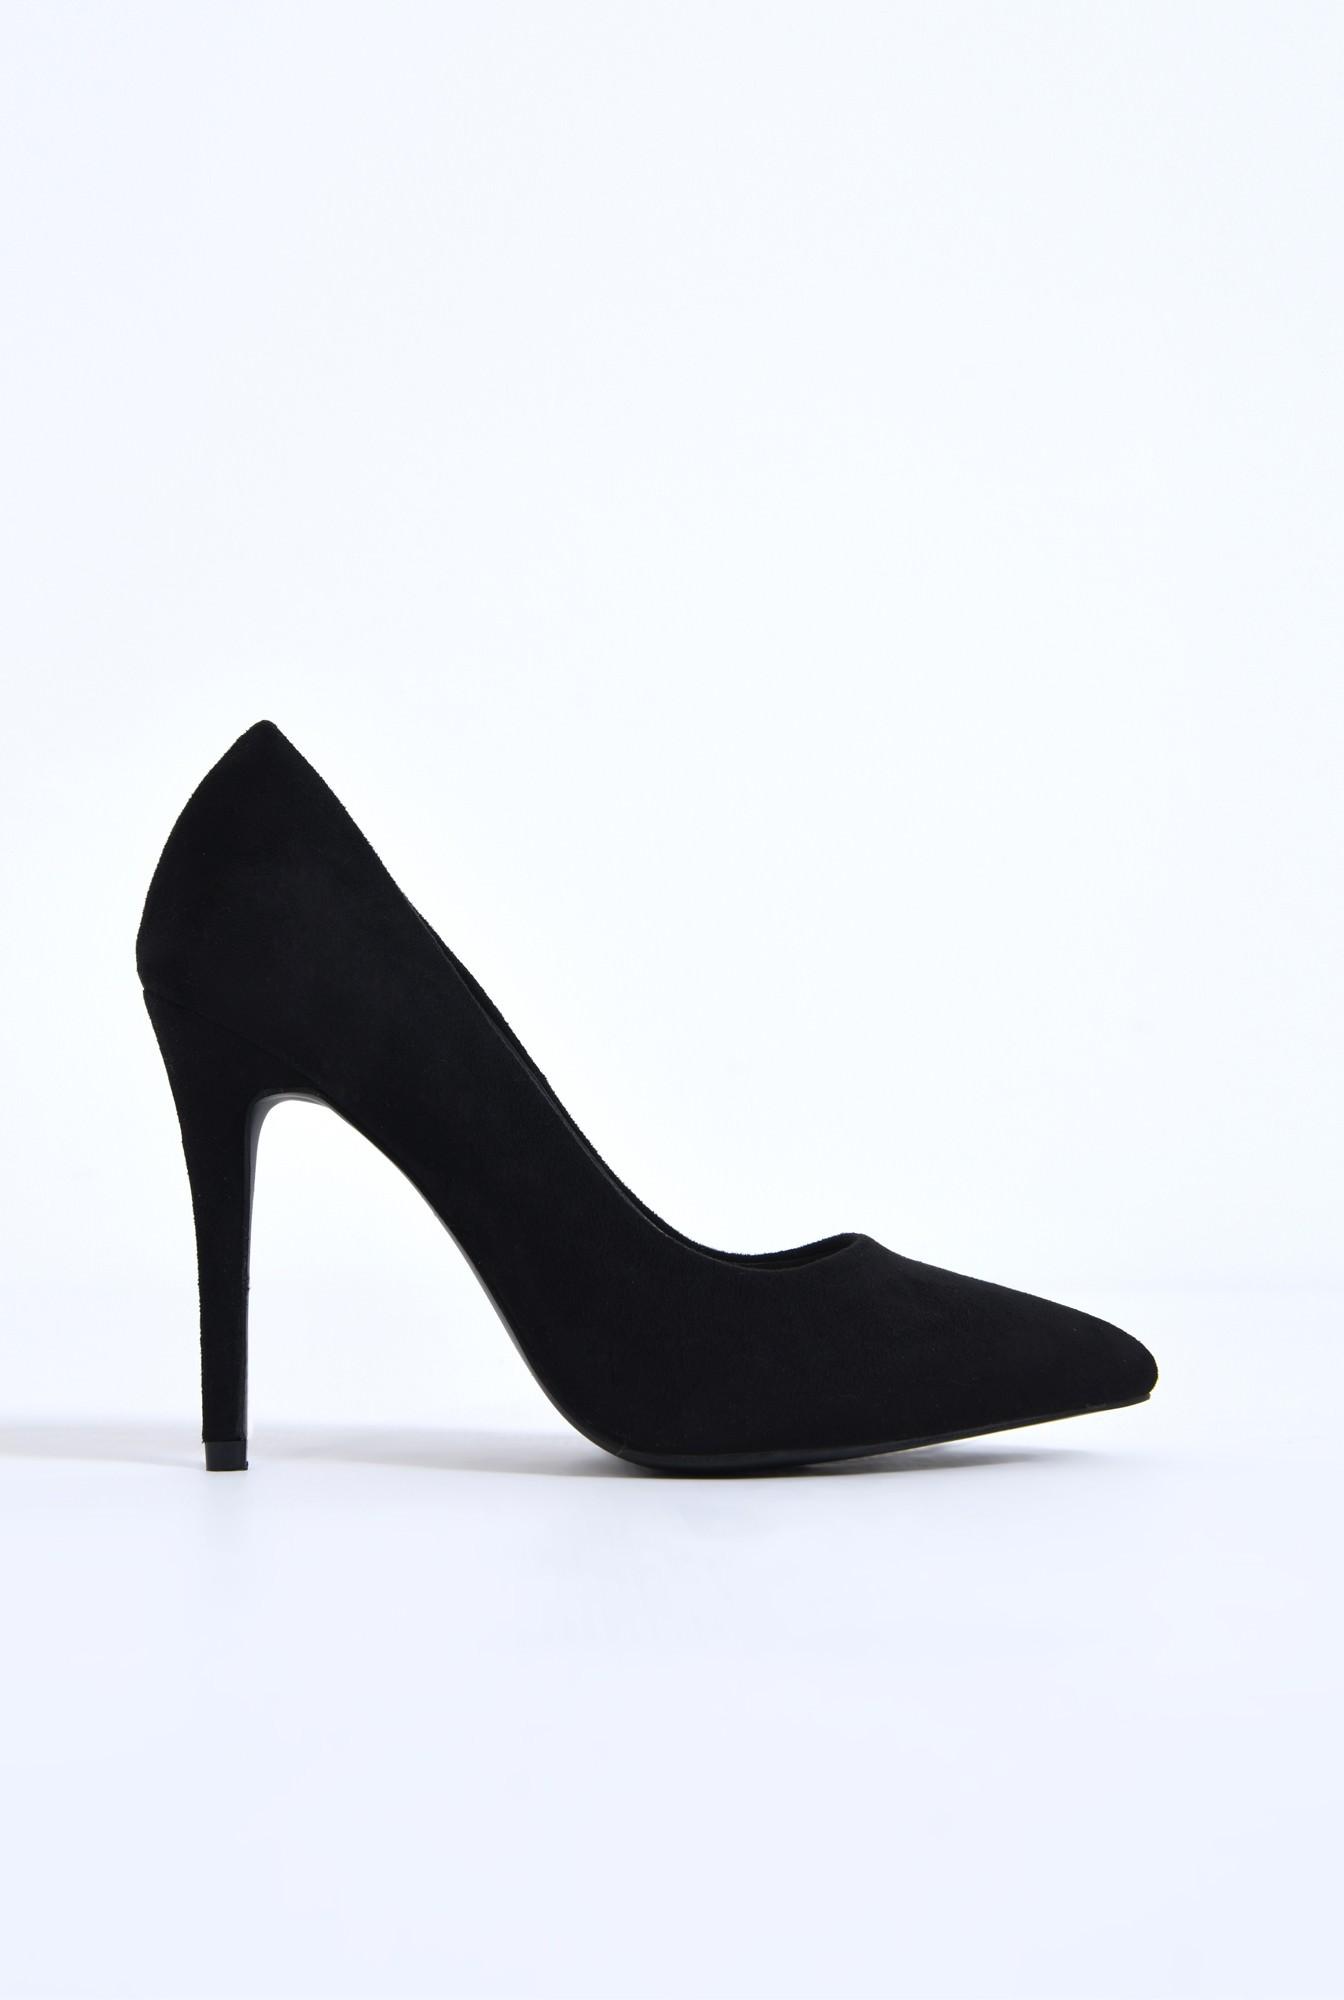 0 - pantofi casual, negru, stiletto